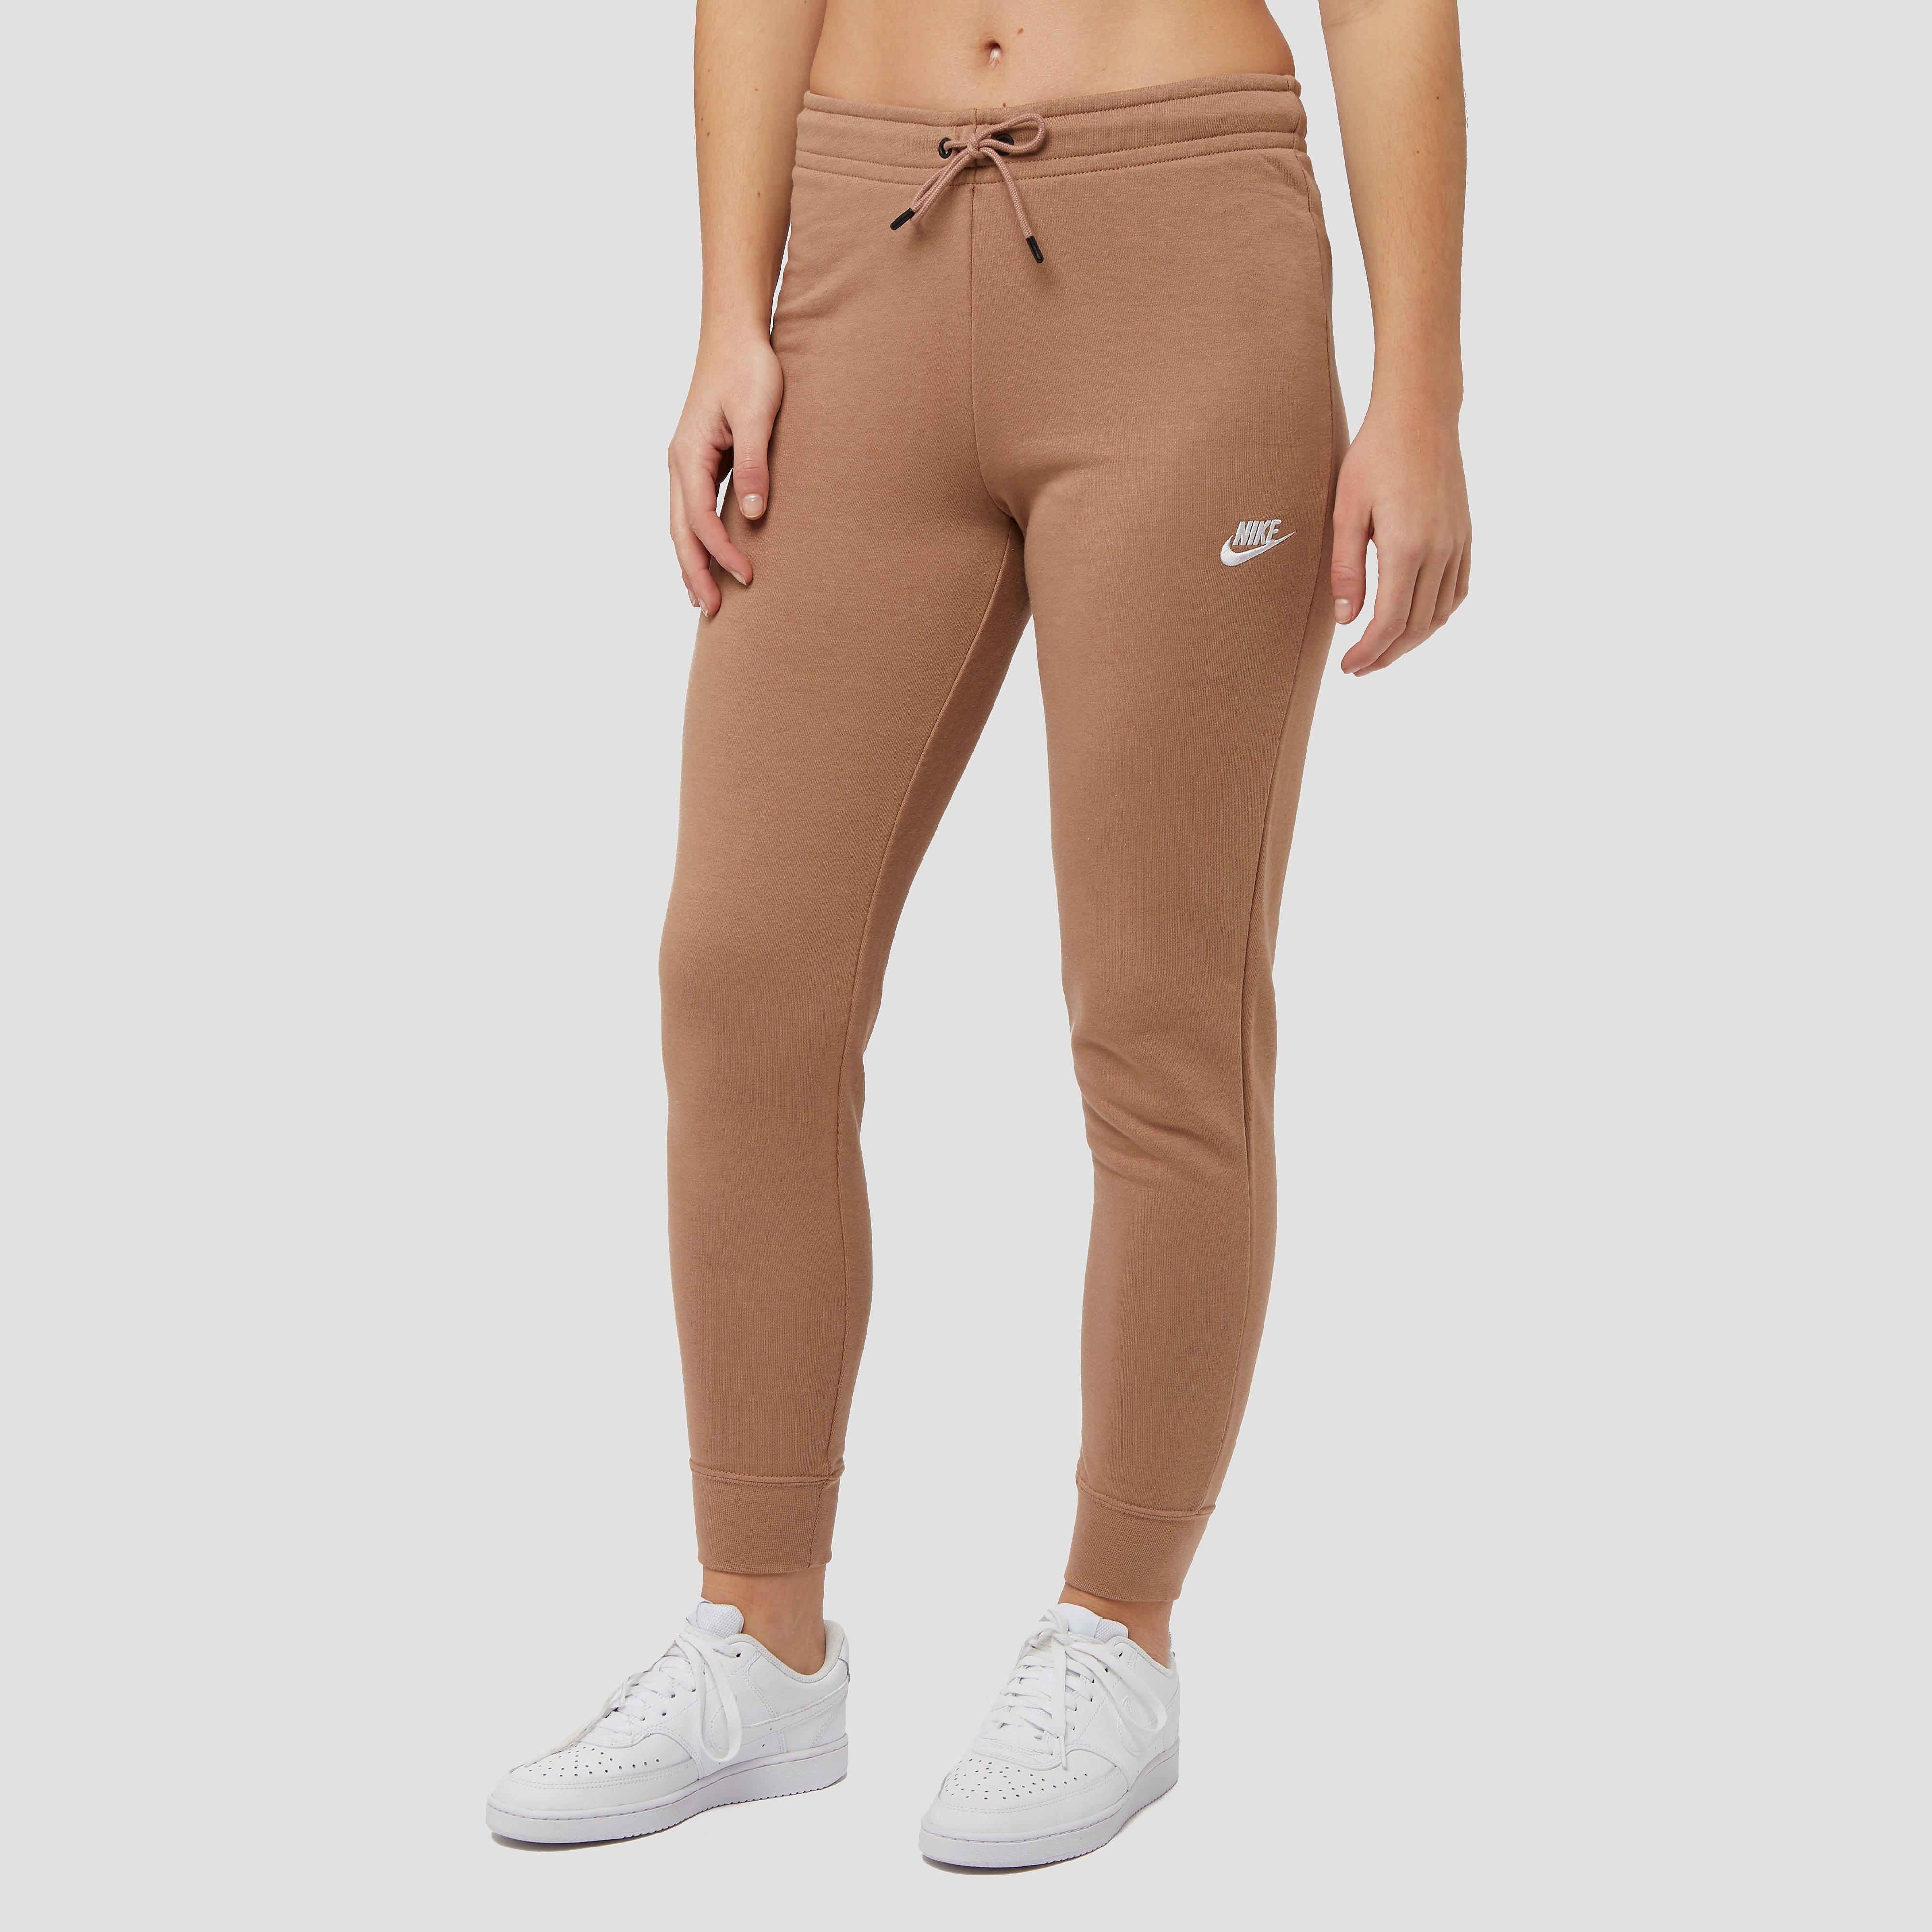 NIKE Sportswear essential joggingbroek bruin dames Dames